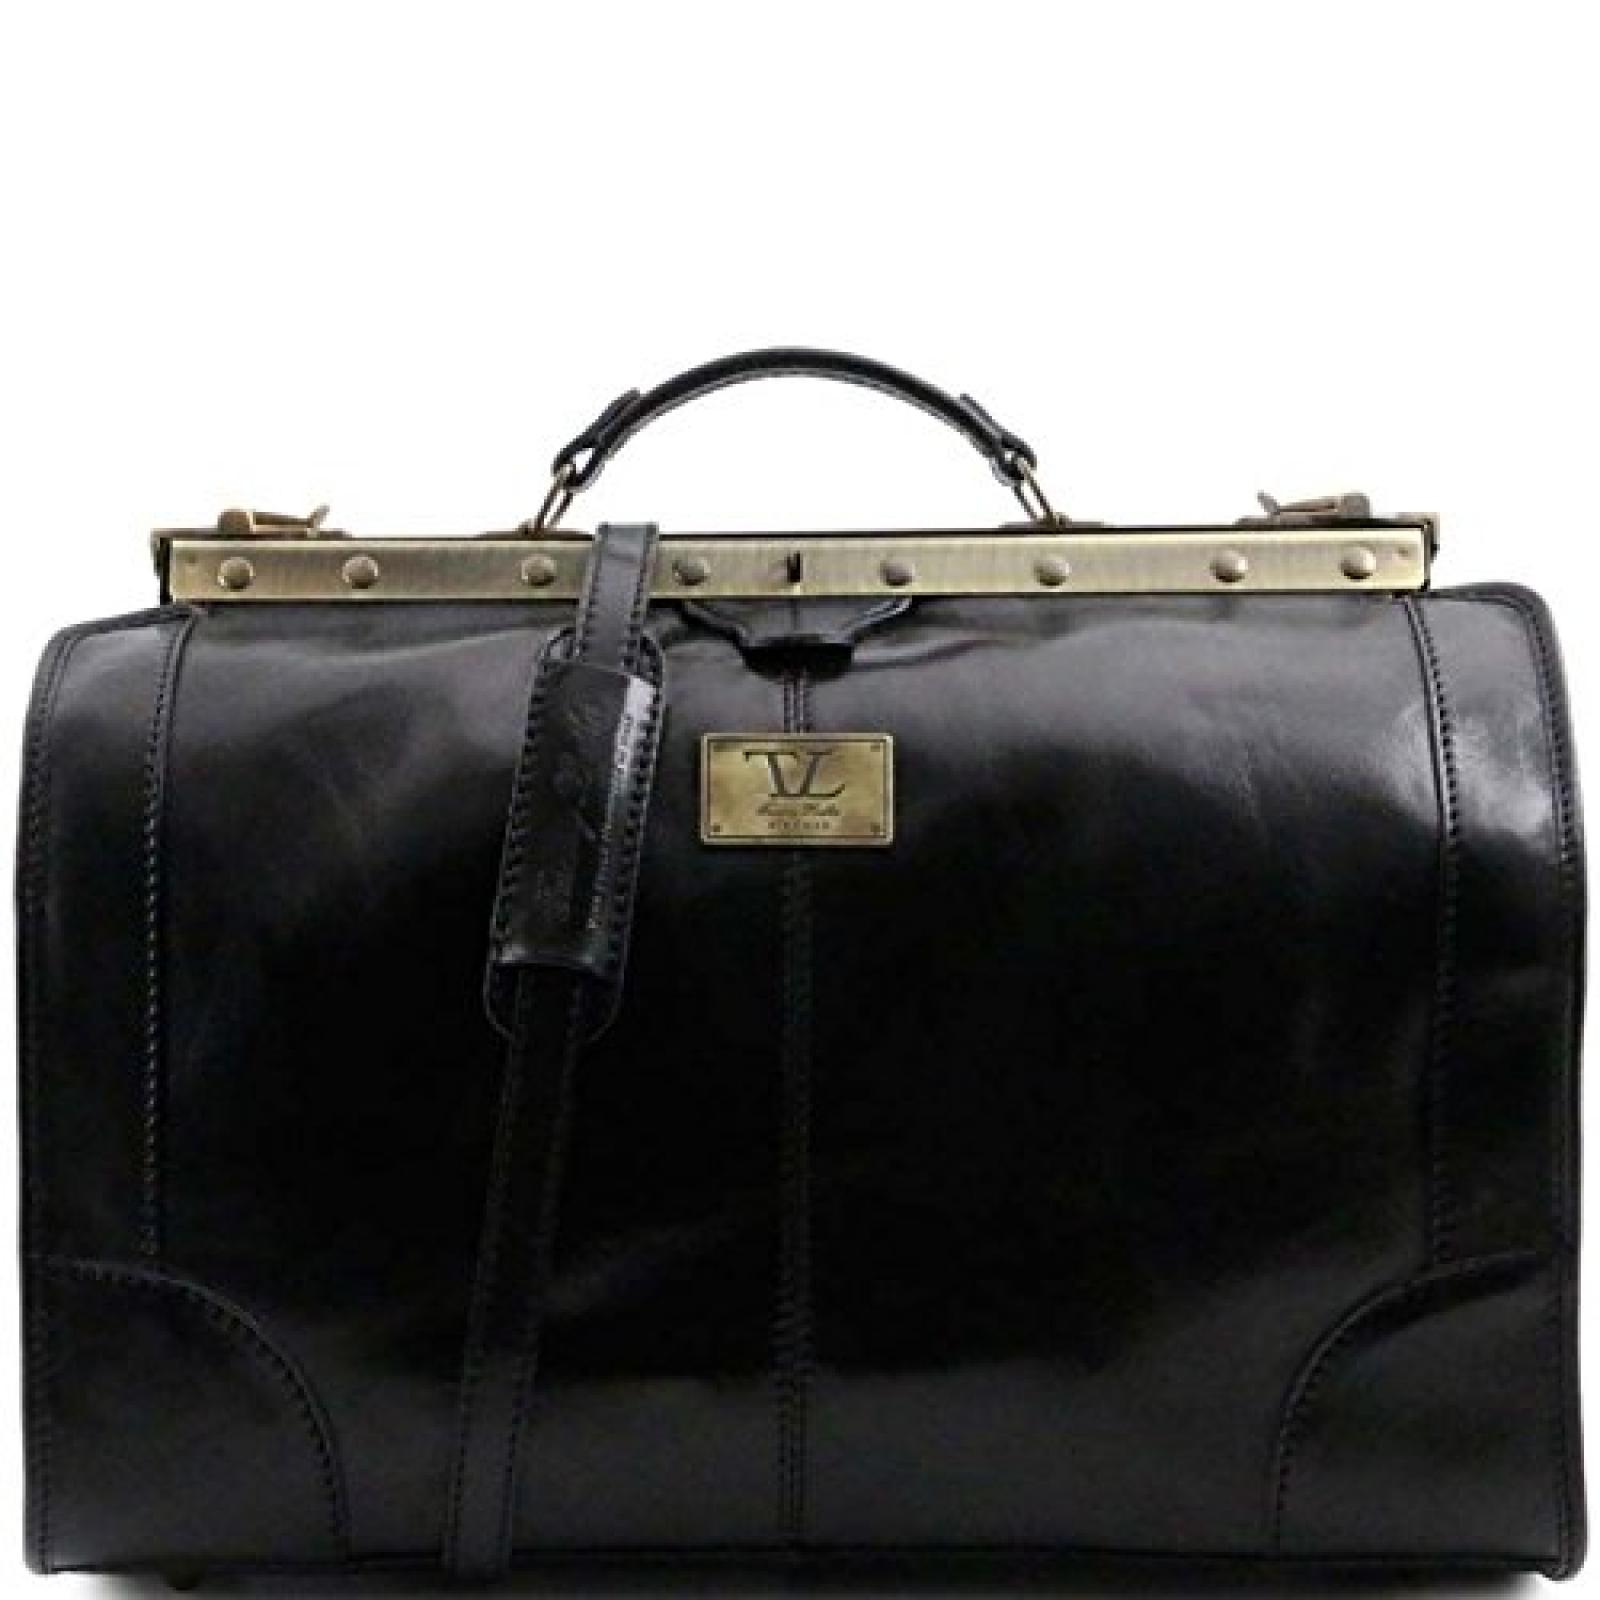 Tuscany Leather - Madrid - Maulbügelreisetasche aus Leder - Klein Schwarz - TL1023/2